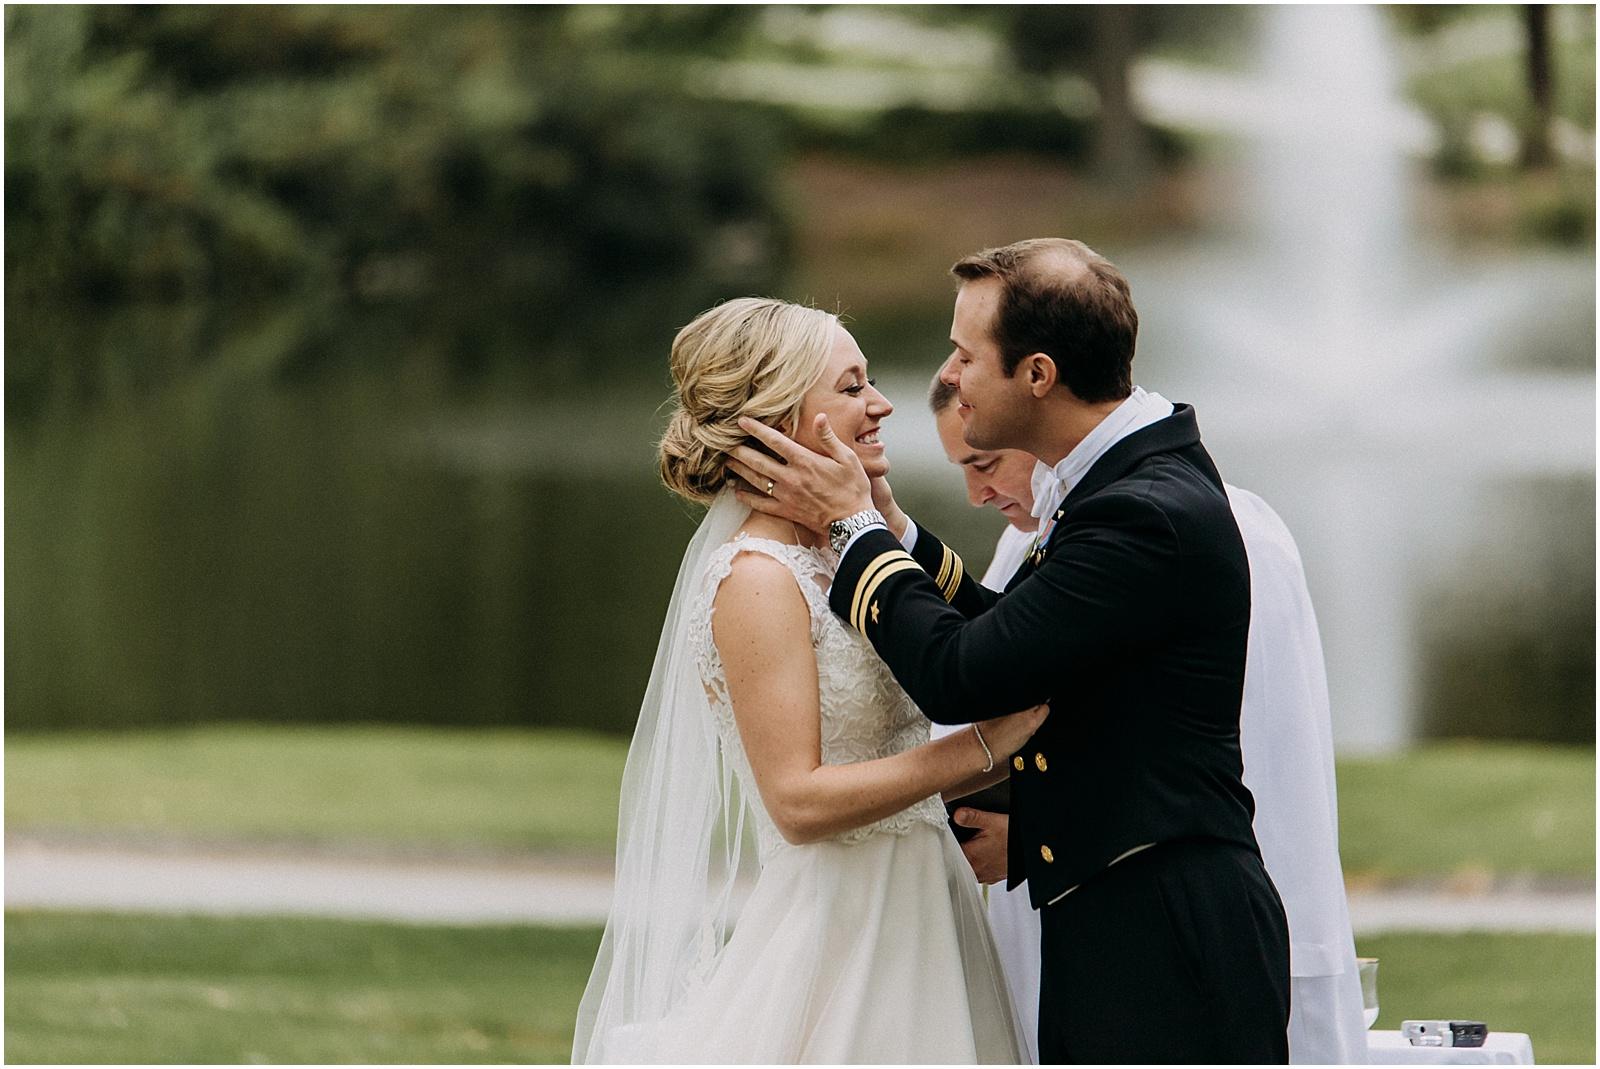 glen_echo_st_louis_mo_wedding_0113.jpg